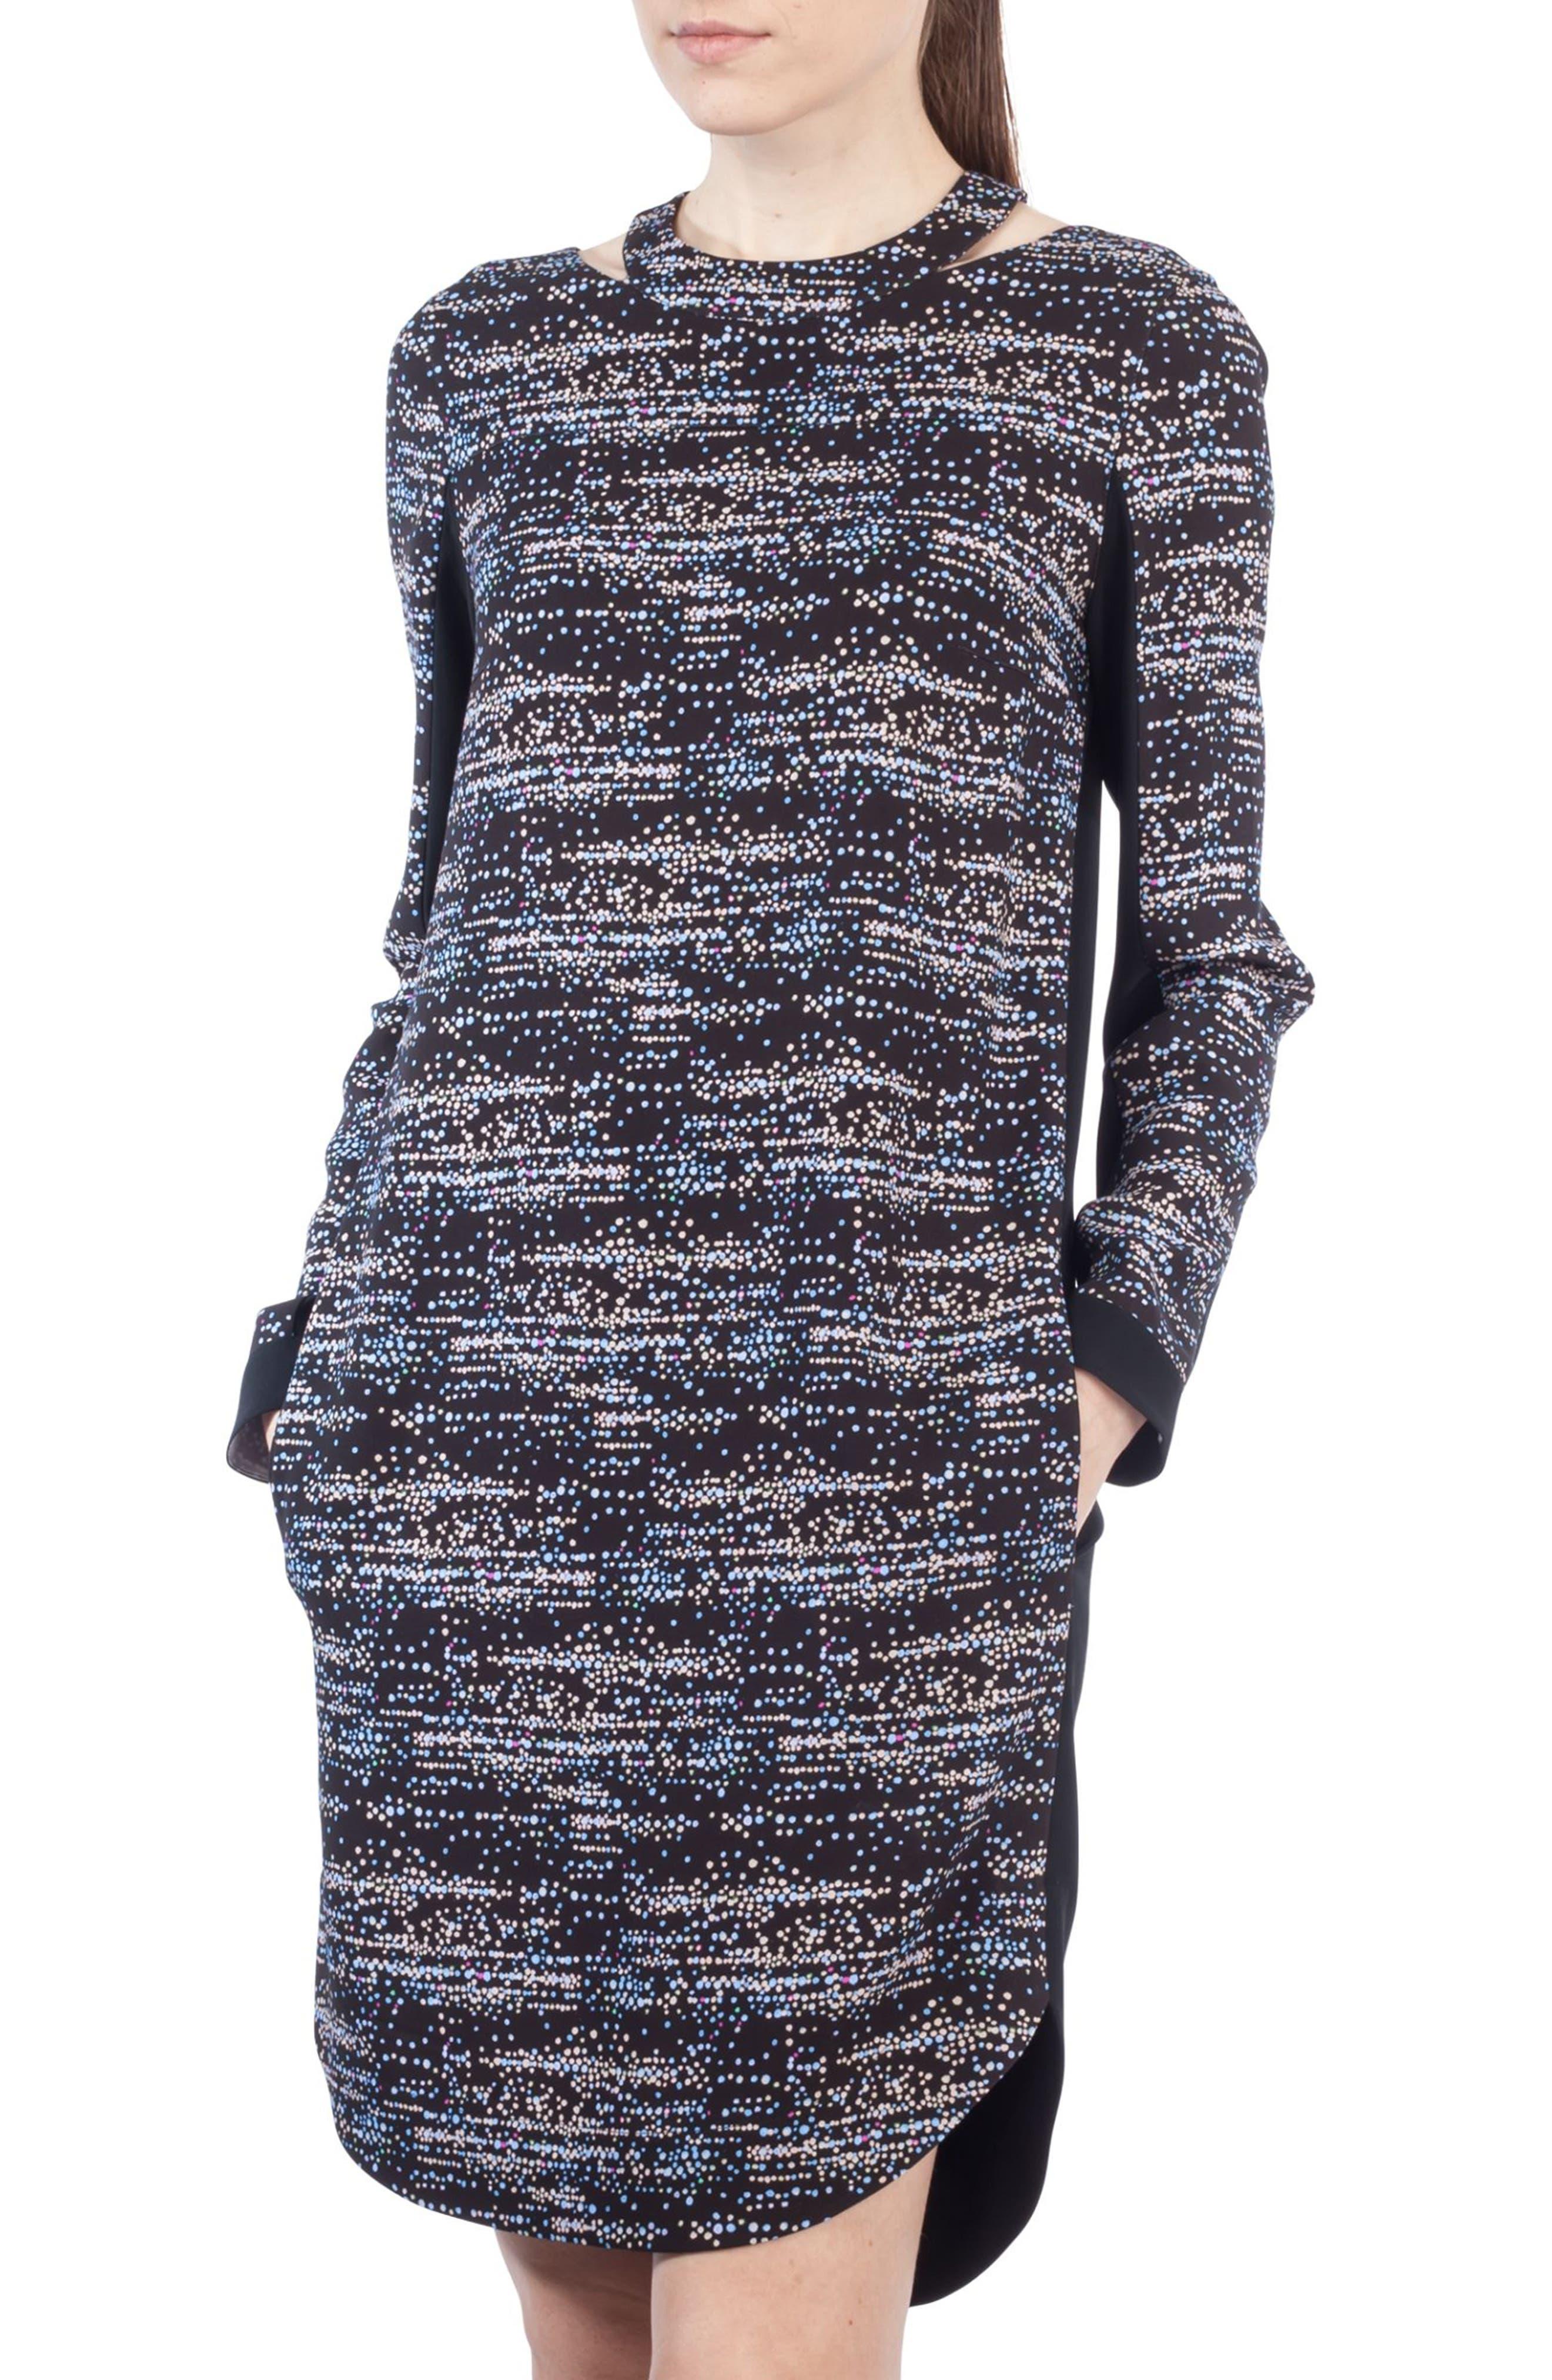 Choker Neck Print Dress,                             Alternate thumbnail 5, color,                             Multicolor